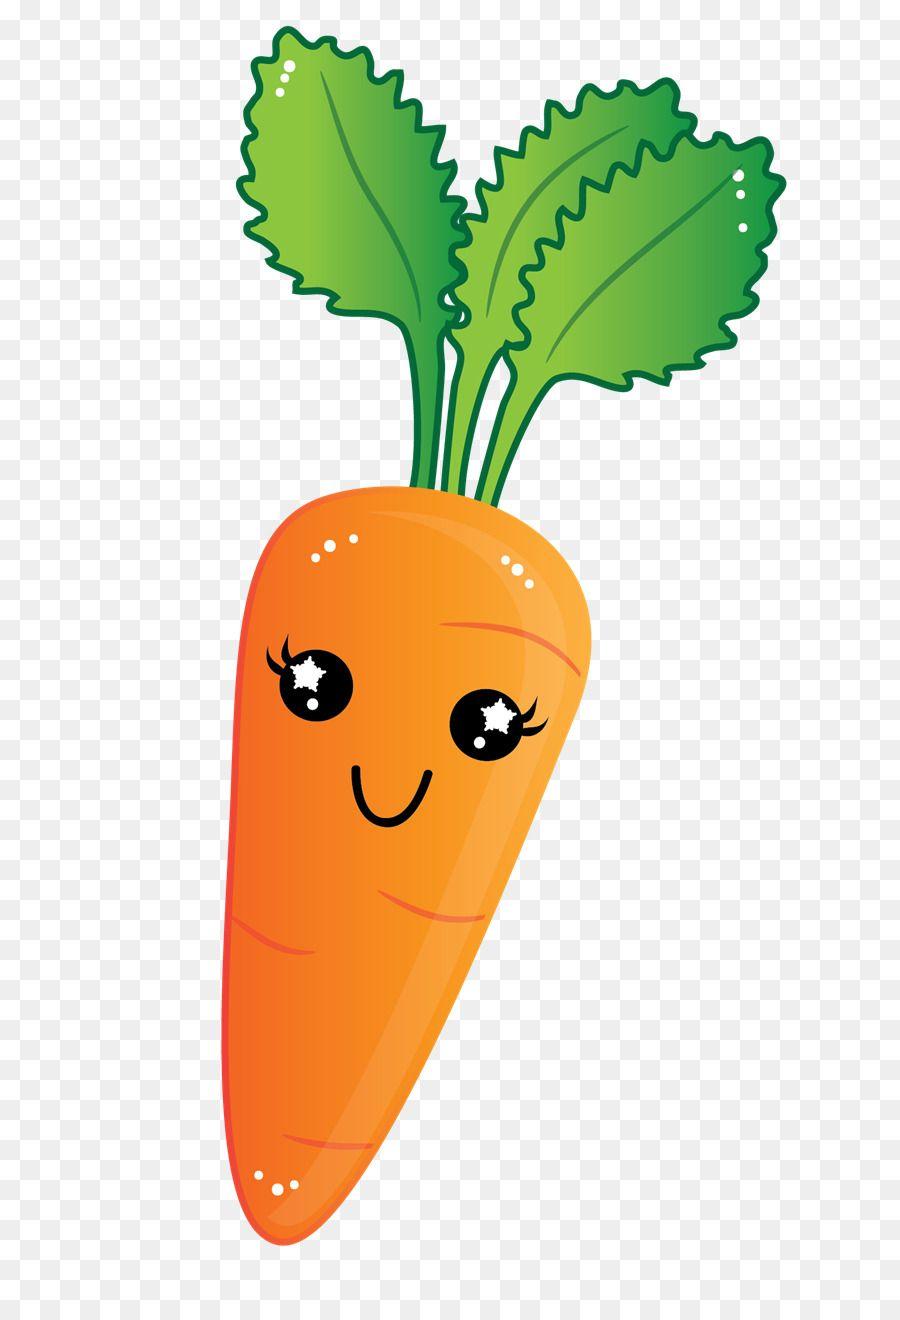 Cute Carrot Clipart Desain Logo Desain